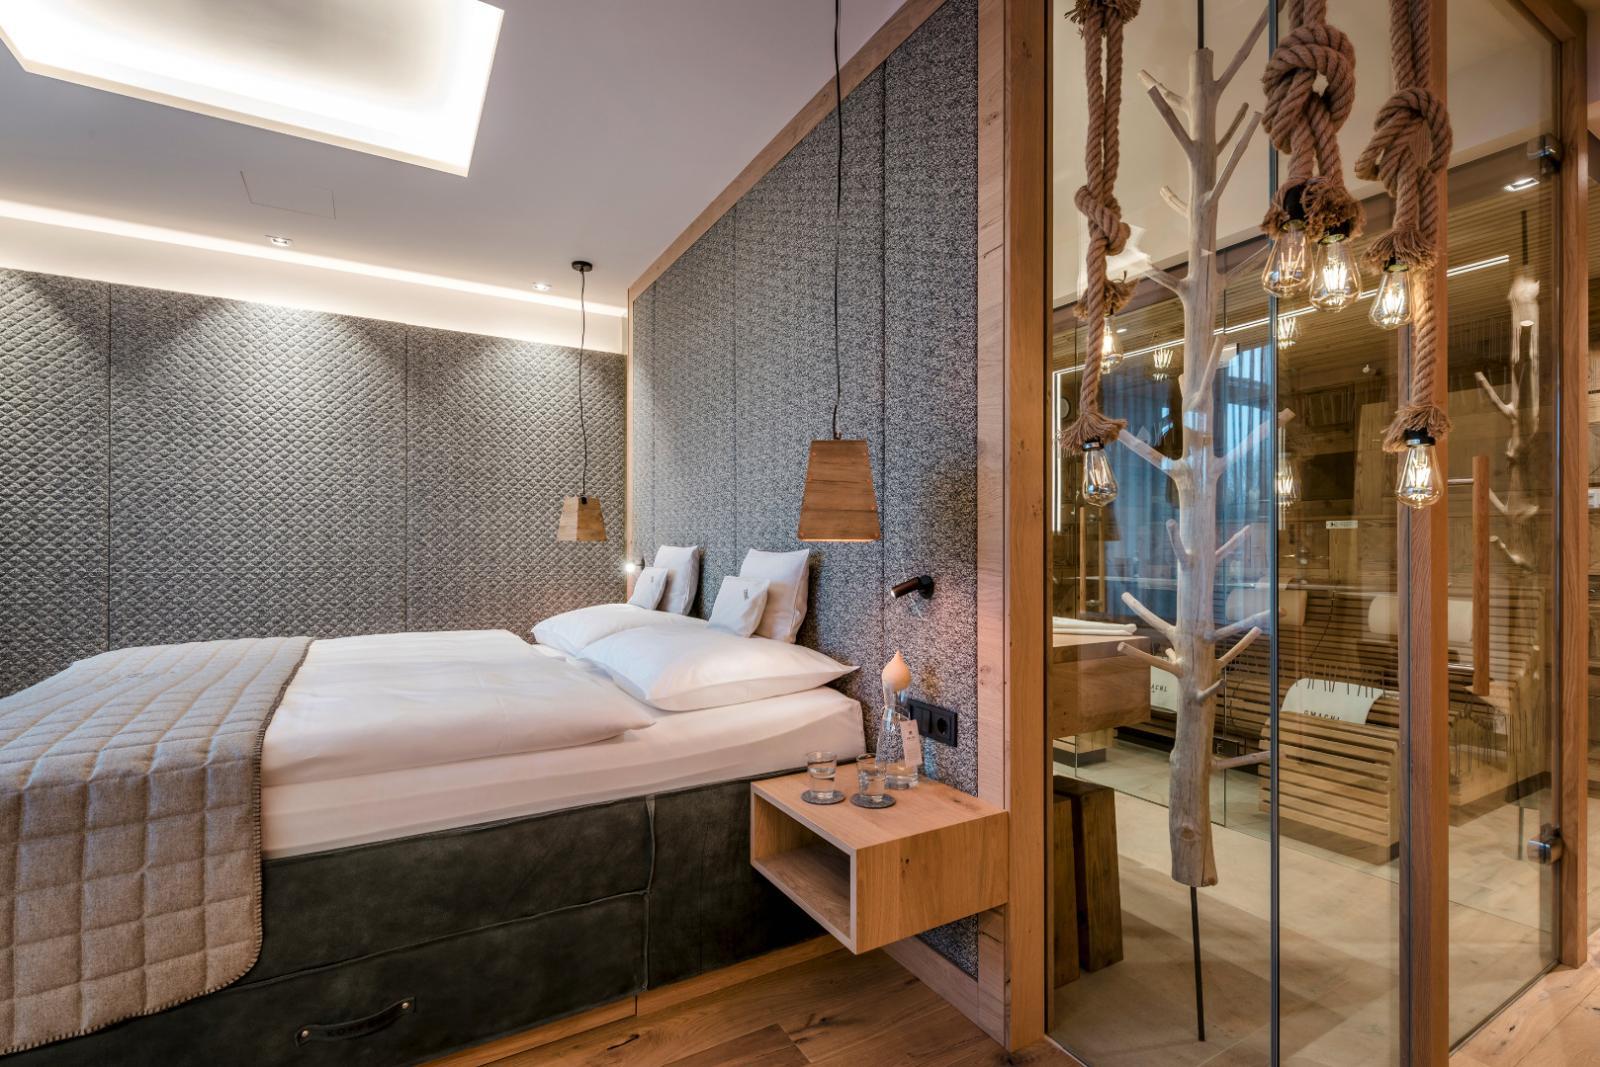 Body-Wrapping: Foto vom Wellnesshotel Genussdorf Gmachl Hotel & Spa   Wellness Salzburger Land